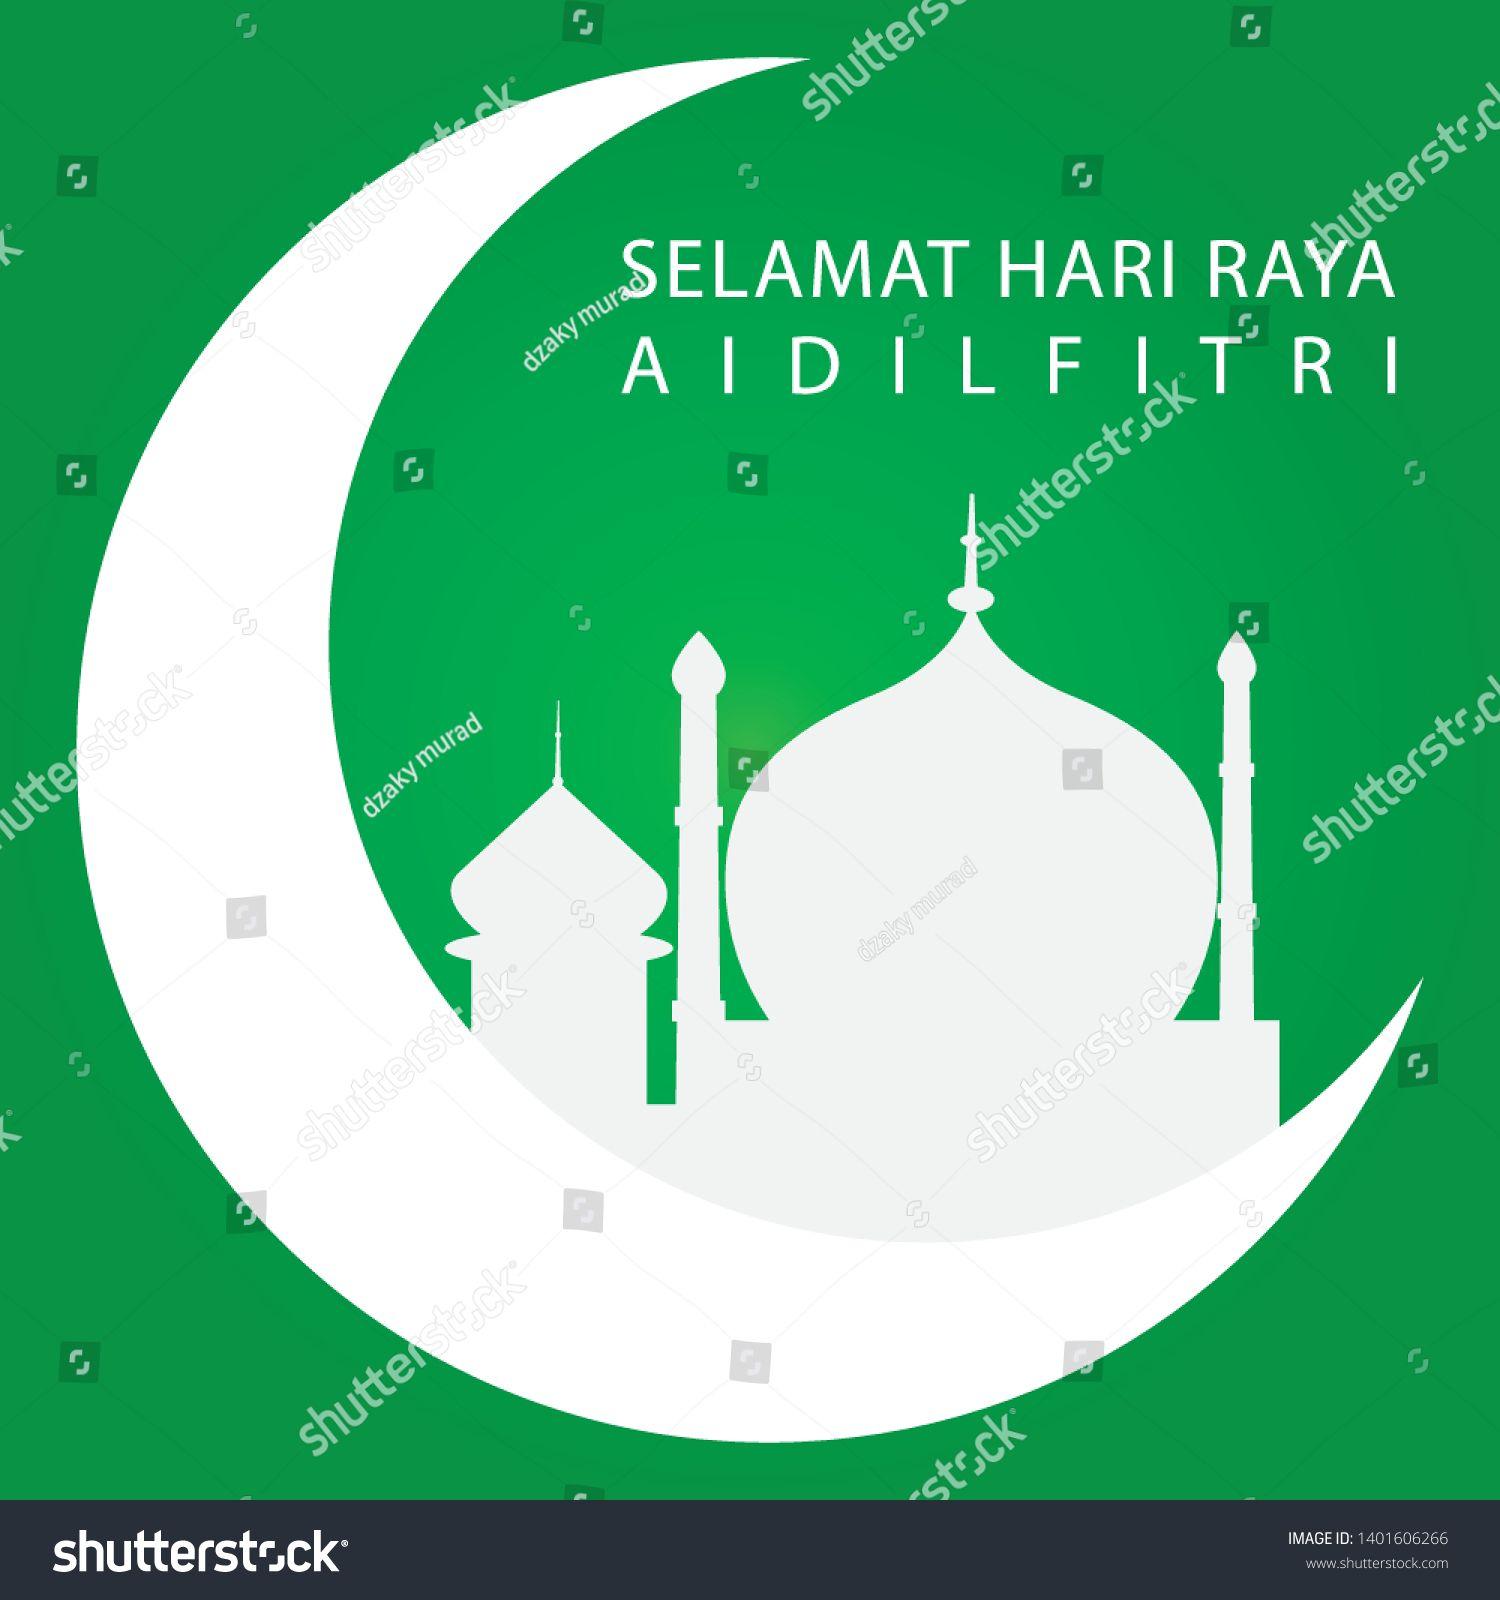 Selamat Hari Raya Aidilfitri Greeting Card Illustration Islamic Pattern With Copy Space And Text Selam Greeting Card Illustration Card Pattern Islamic Pattern